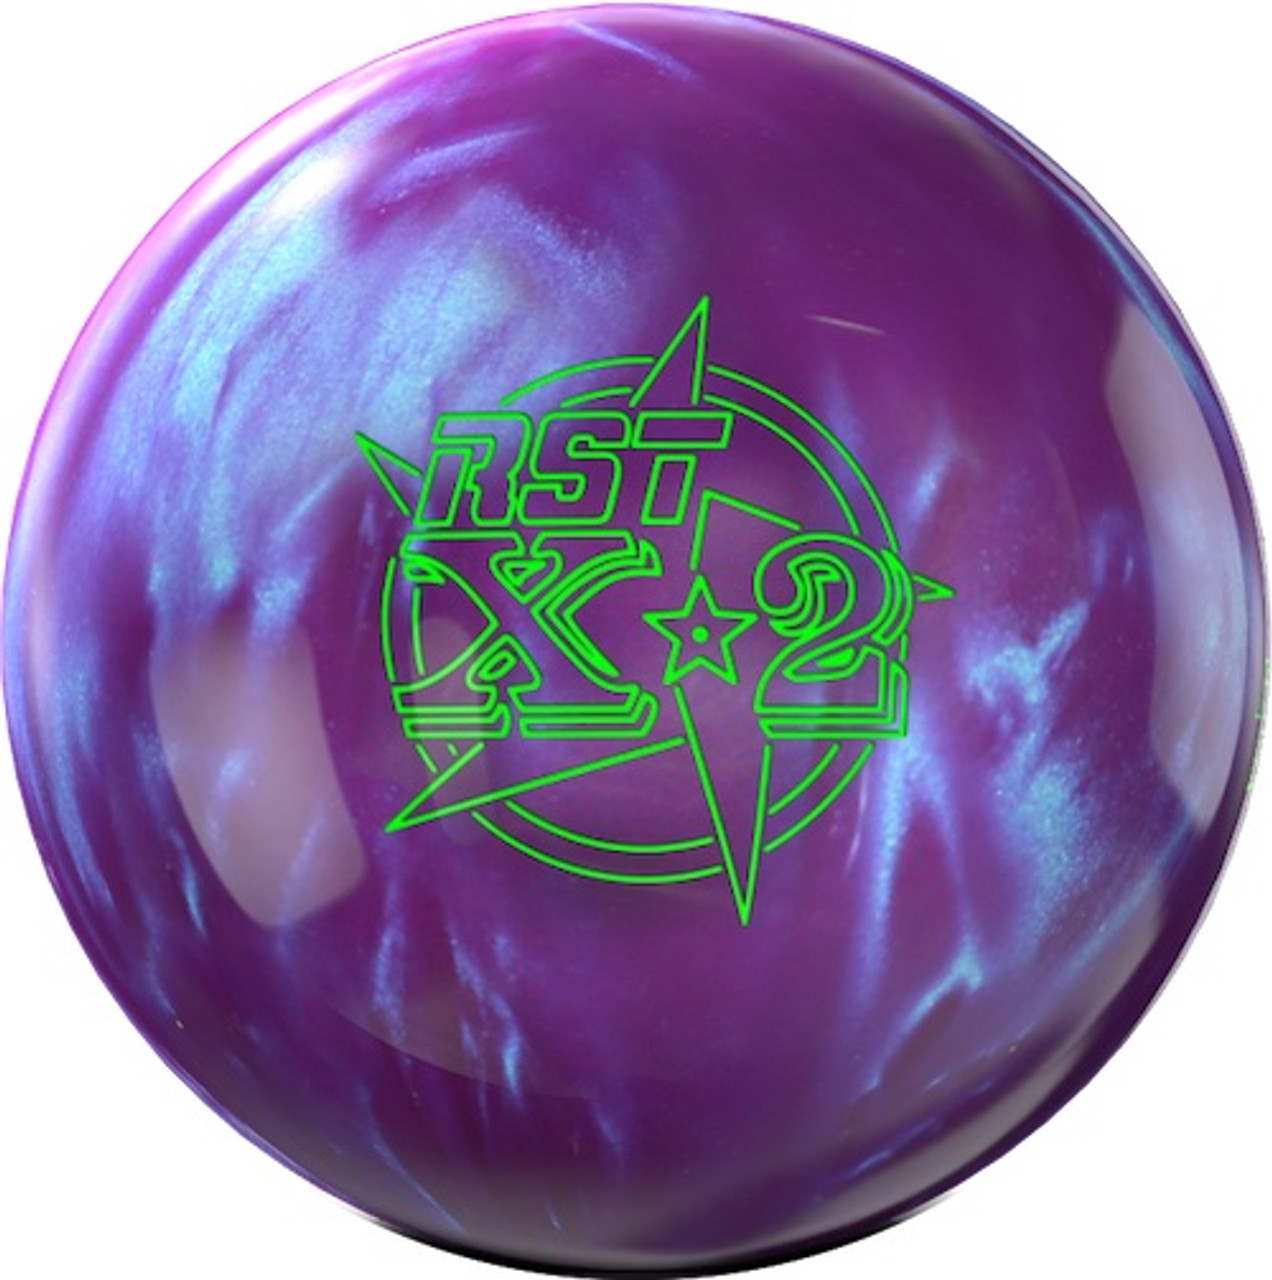 Roto-Grip RST X-2 Bowling Ball